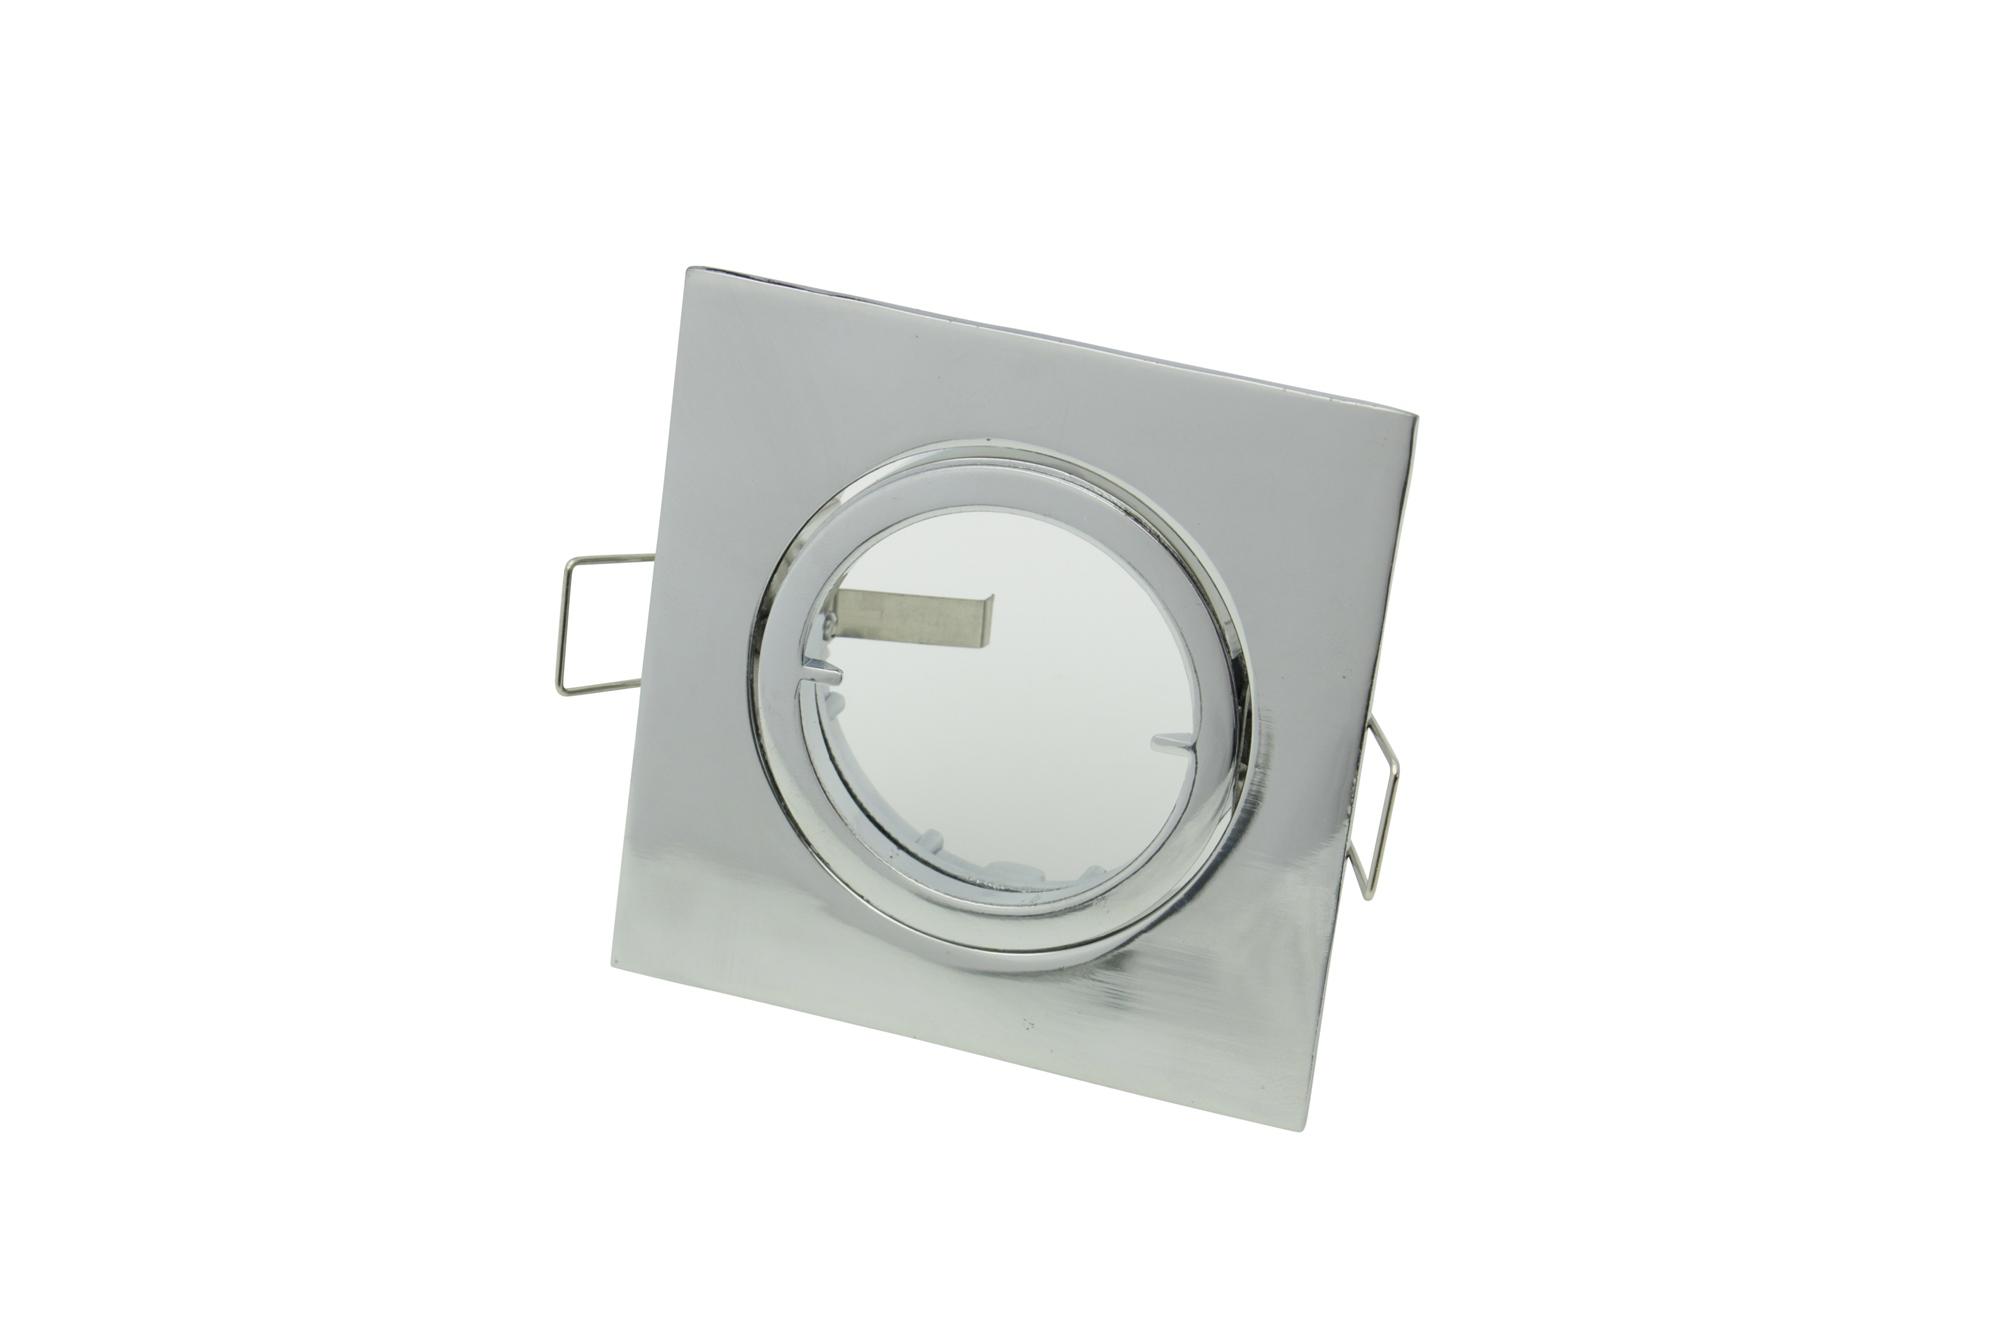 Lampenlux Einbaustrahler Spot Snap eckig Chrom schwenkbar 8.2x8.2cm 230V GU10 rostfrei Aluminium